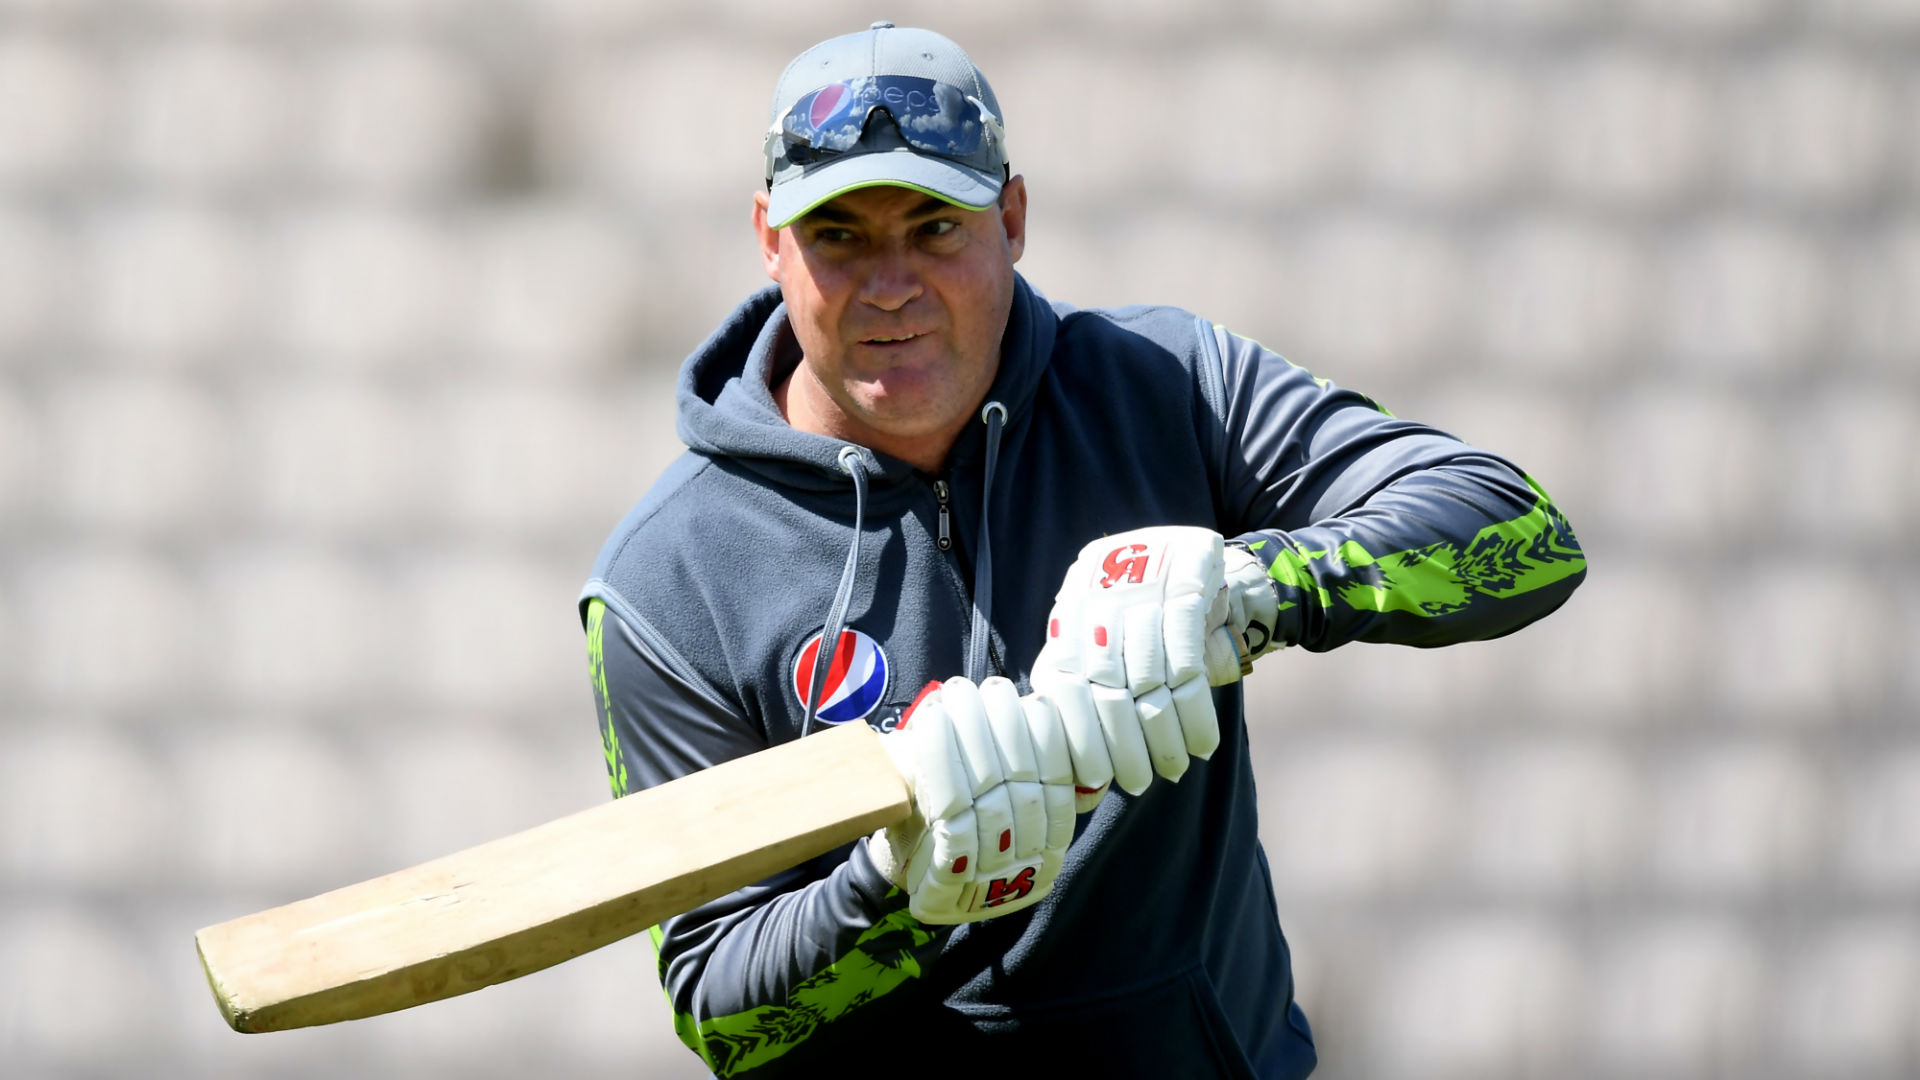 Arthur 'very confident' in Pakistan CWC hopes despite losing streak